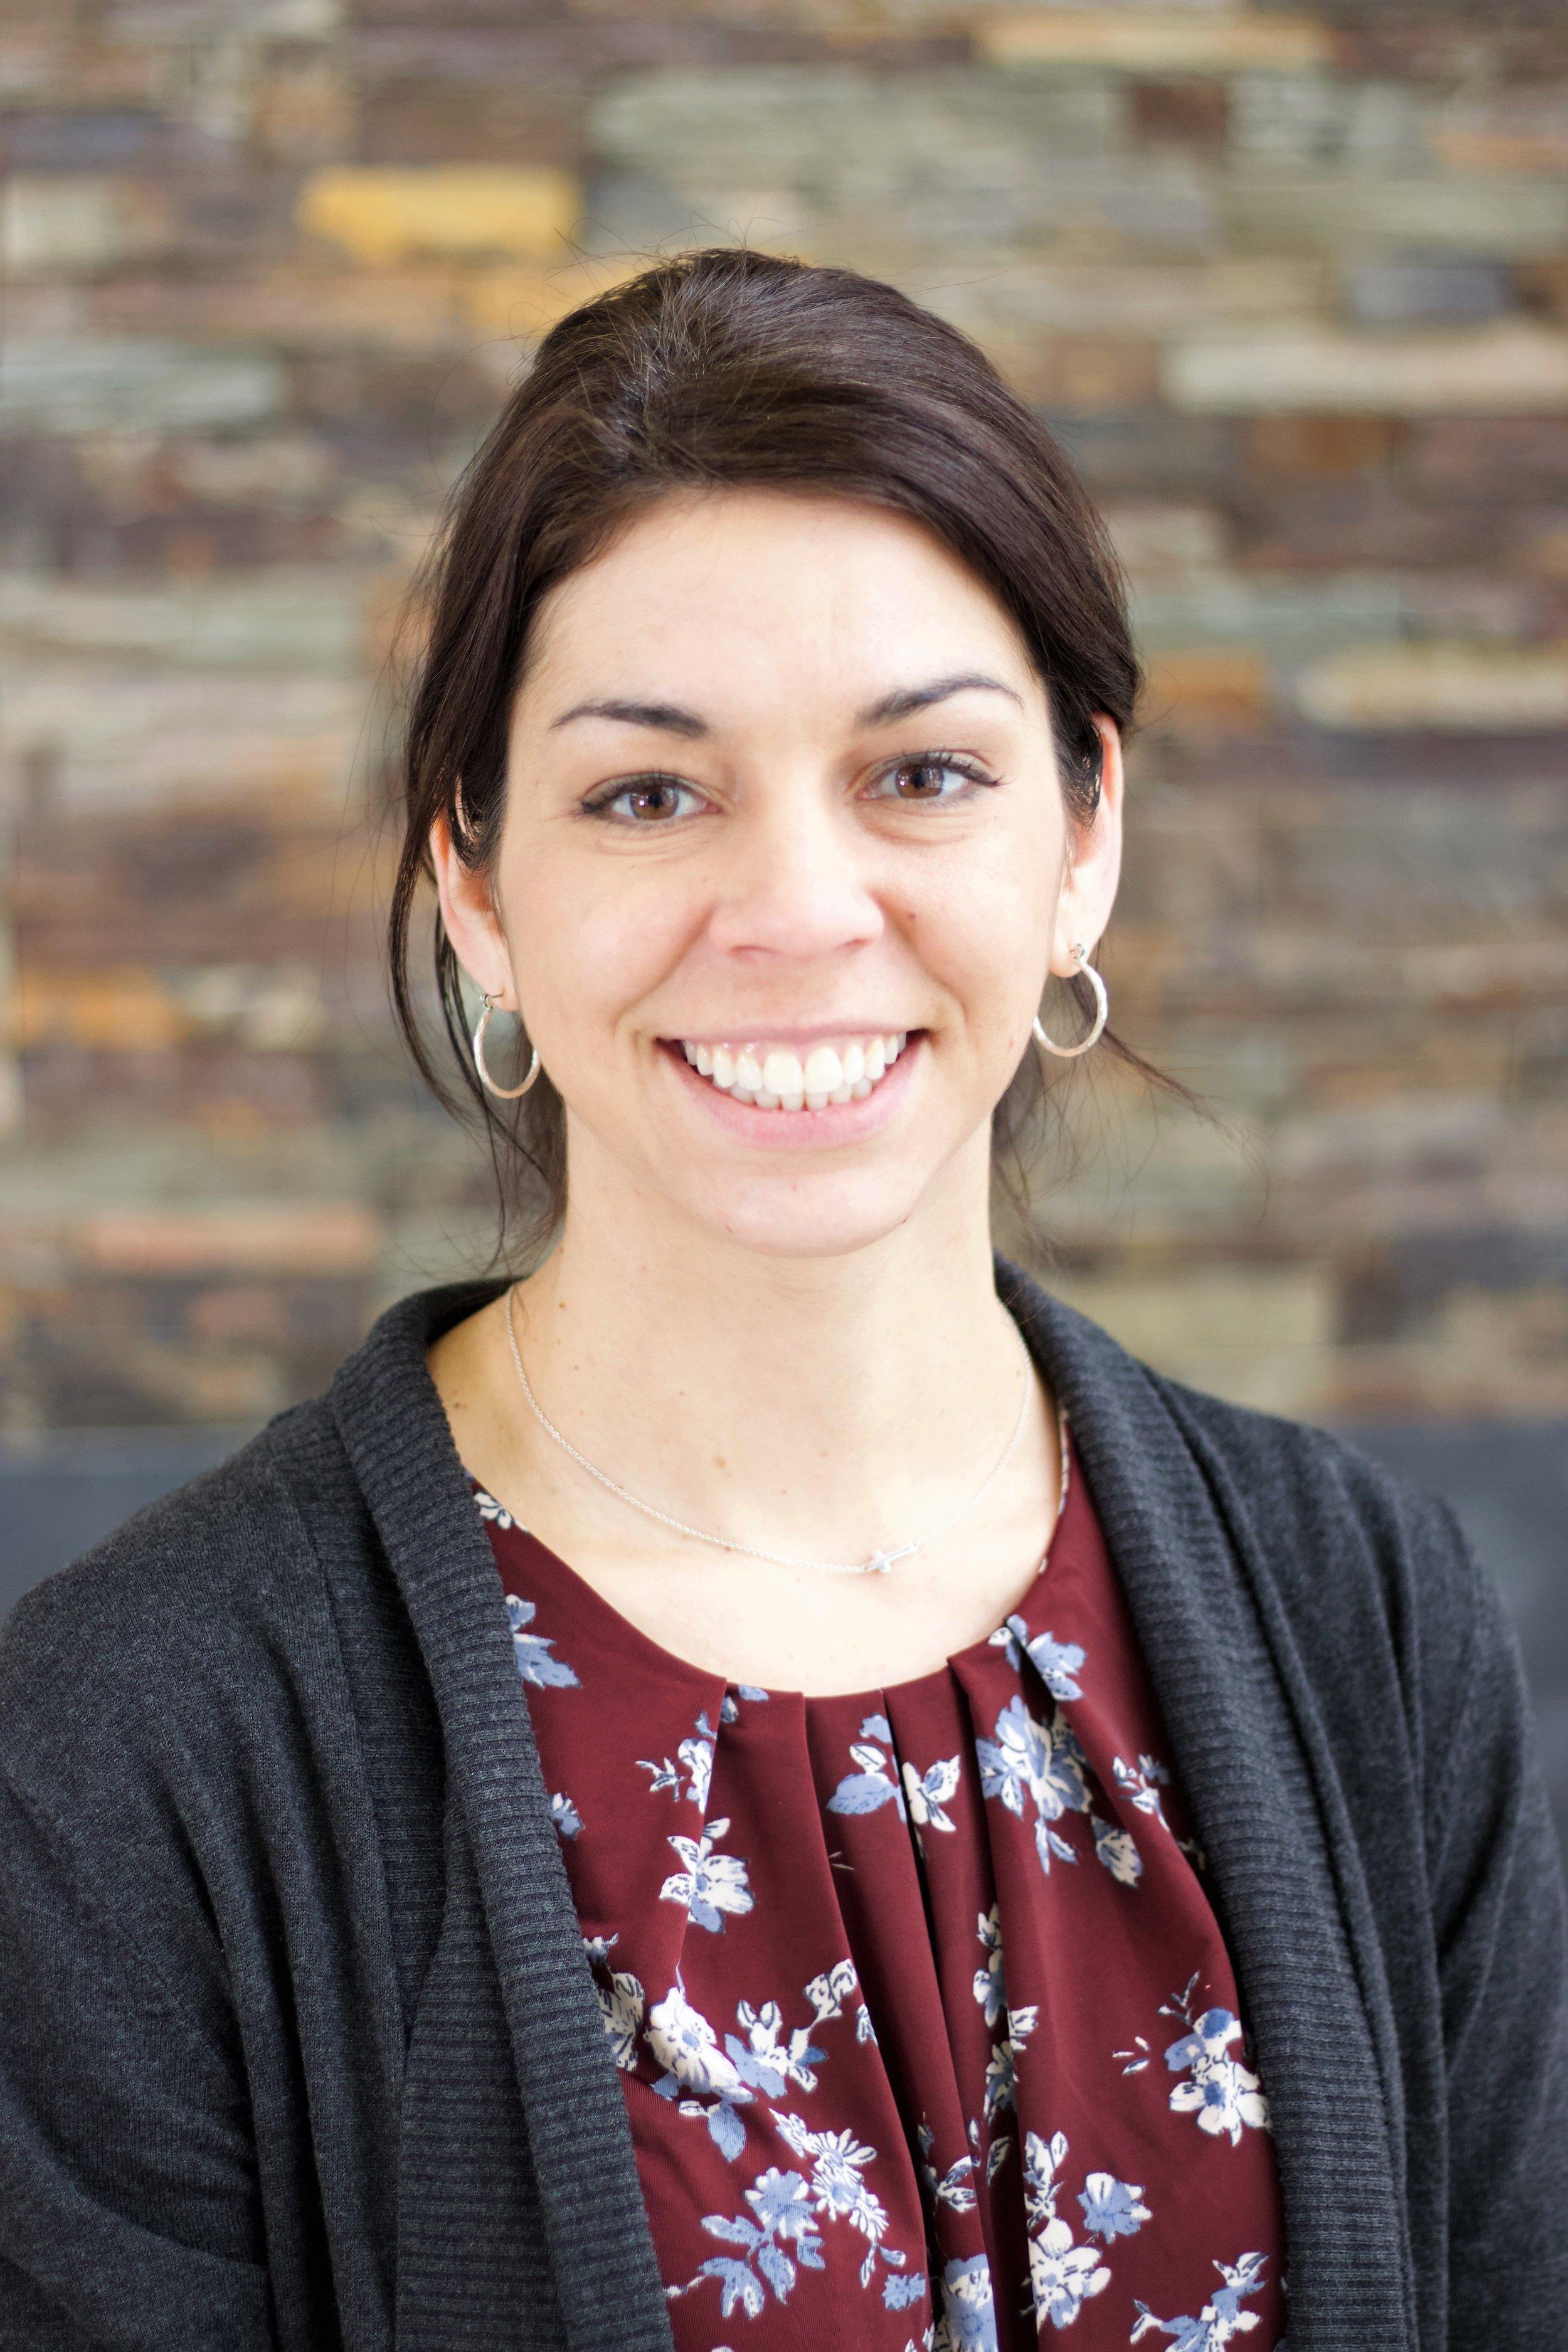 Mrs. Elizabeth Matthews - Educational Assistant, Grade 1/2